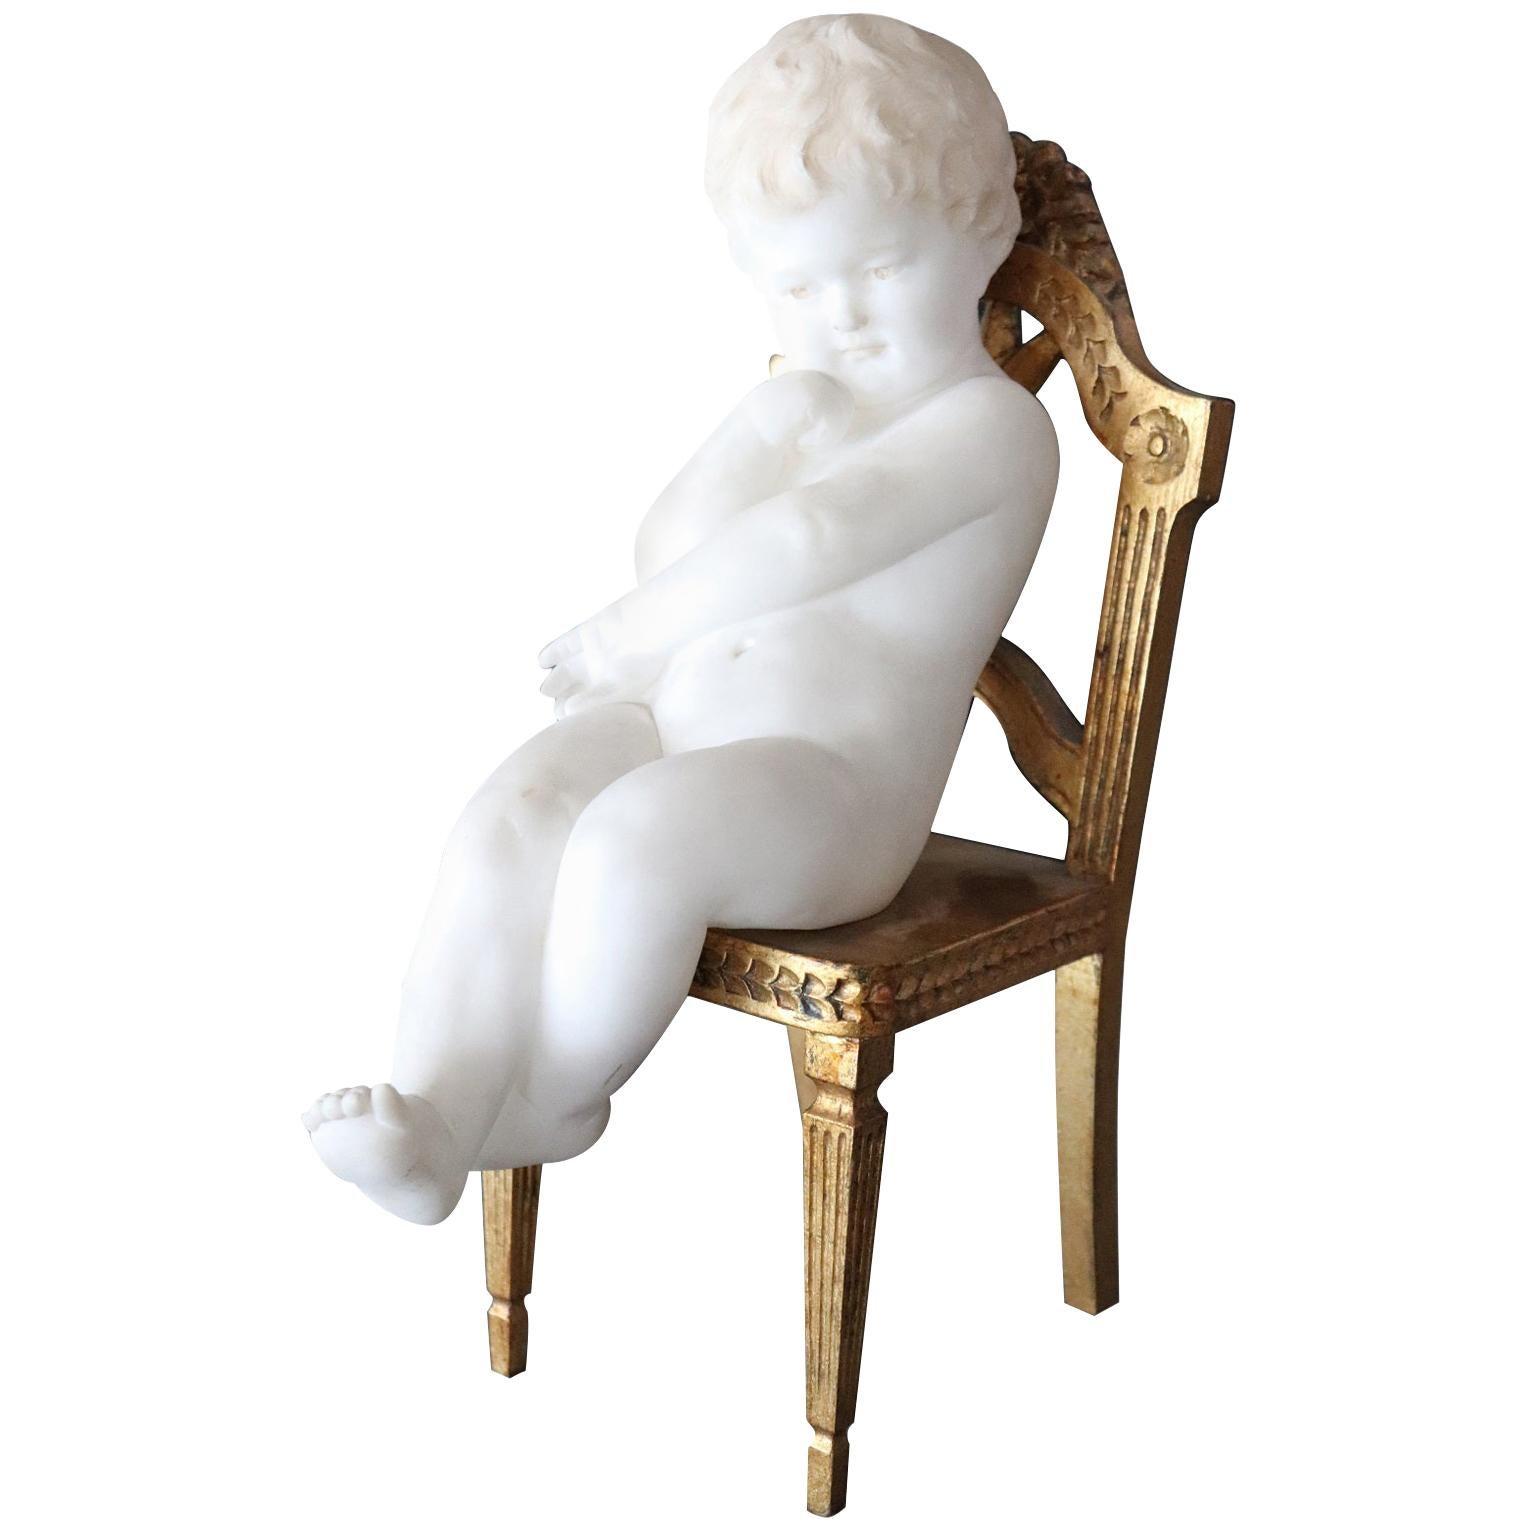 19th Century Italian Sculpture in Precious White Marble of Carrara, Child